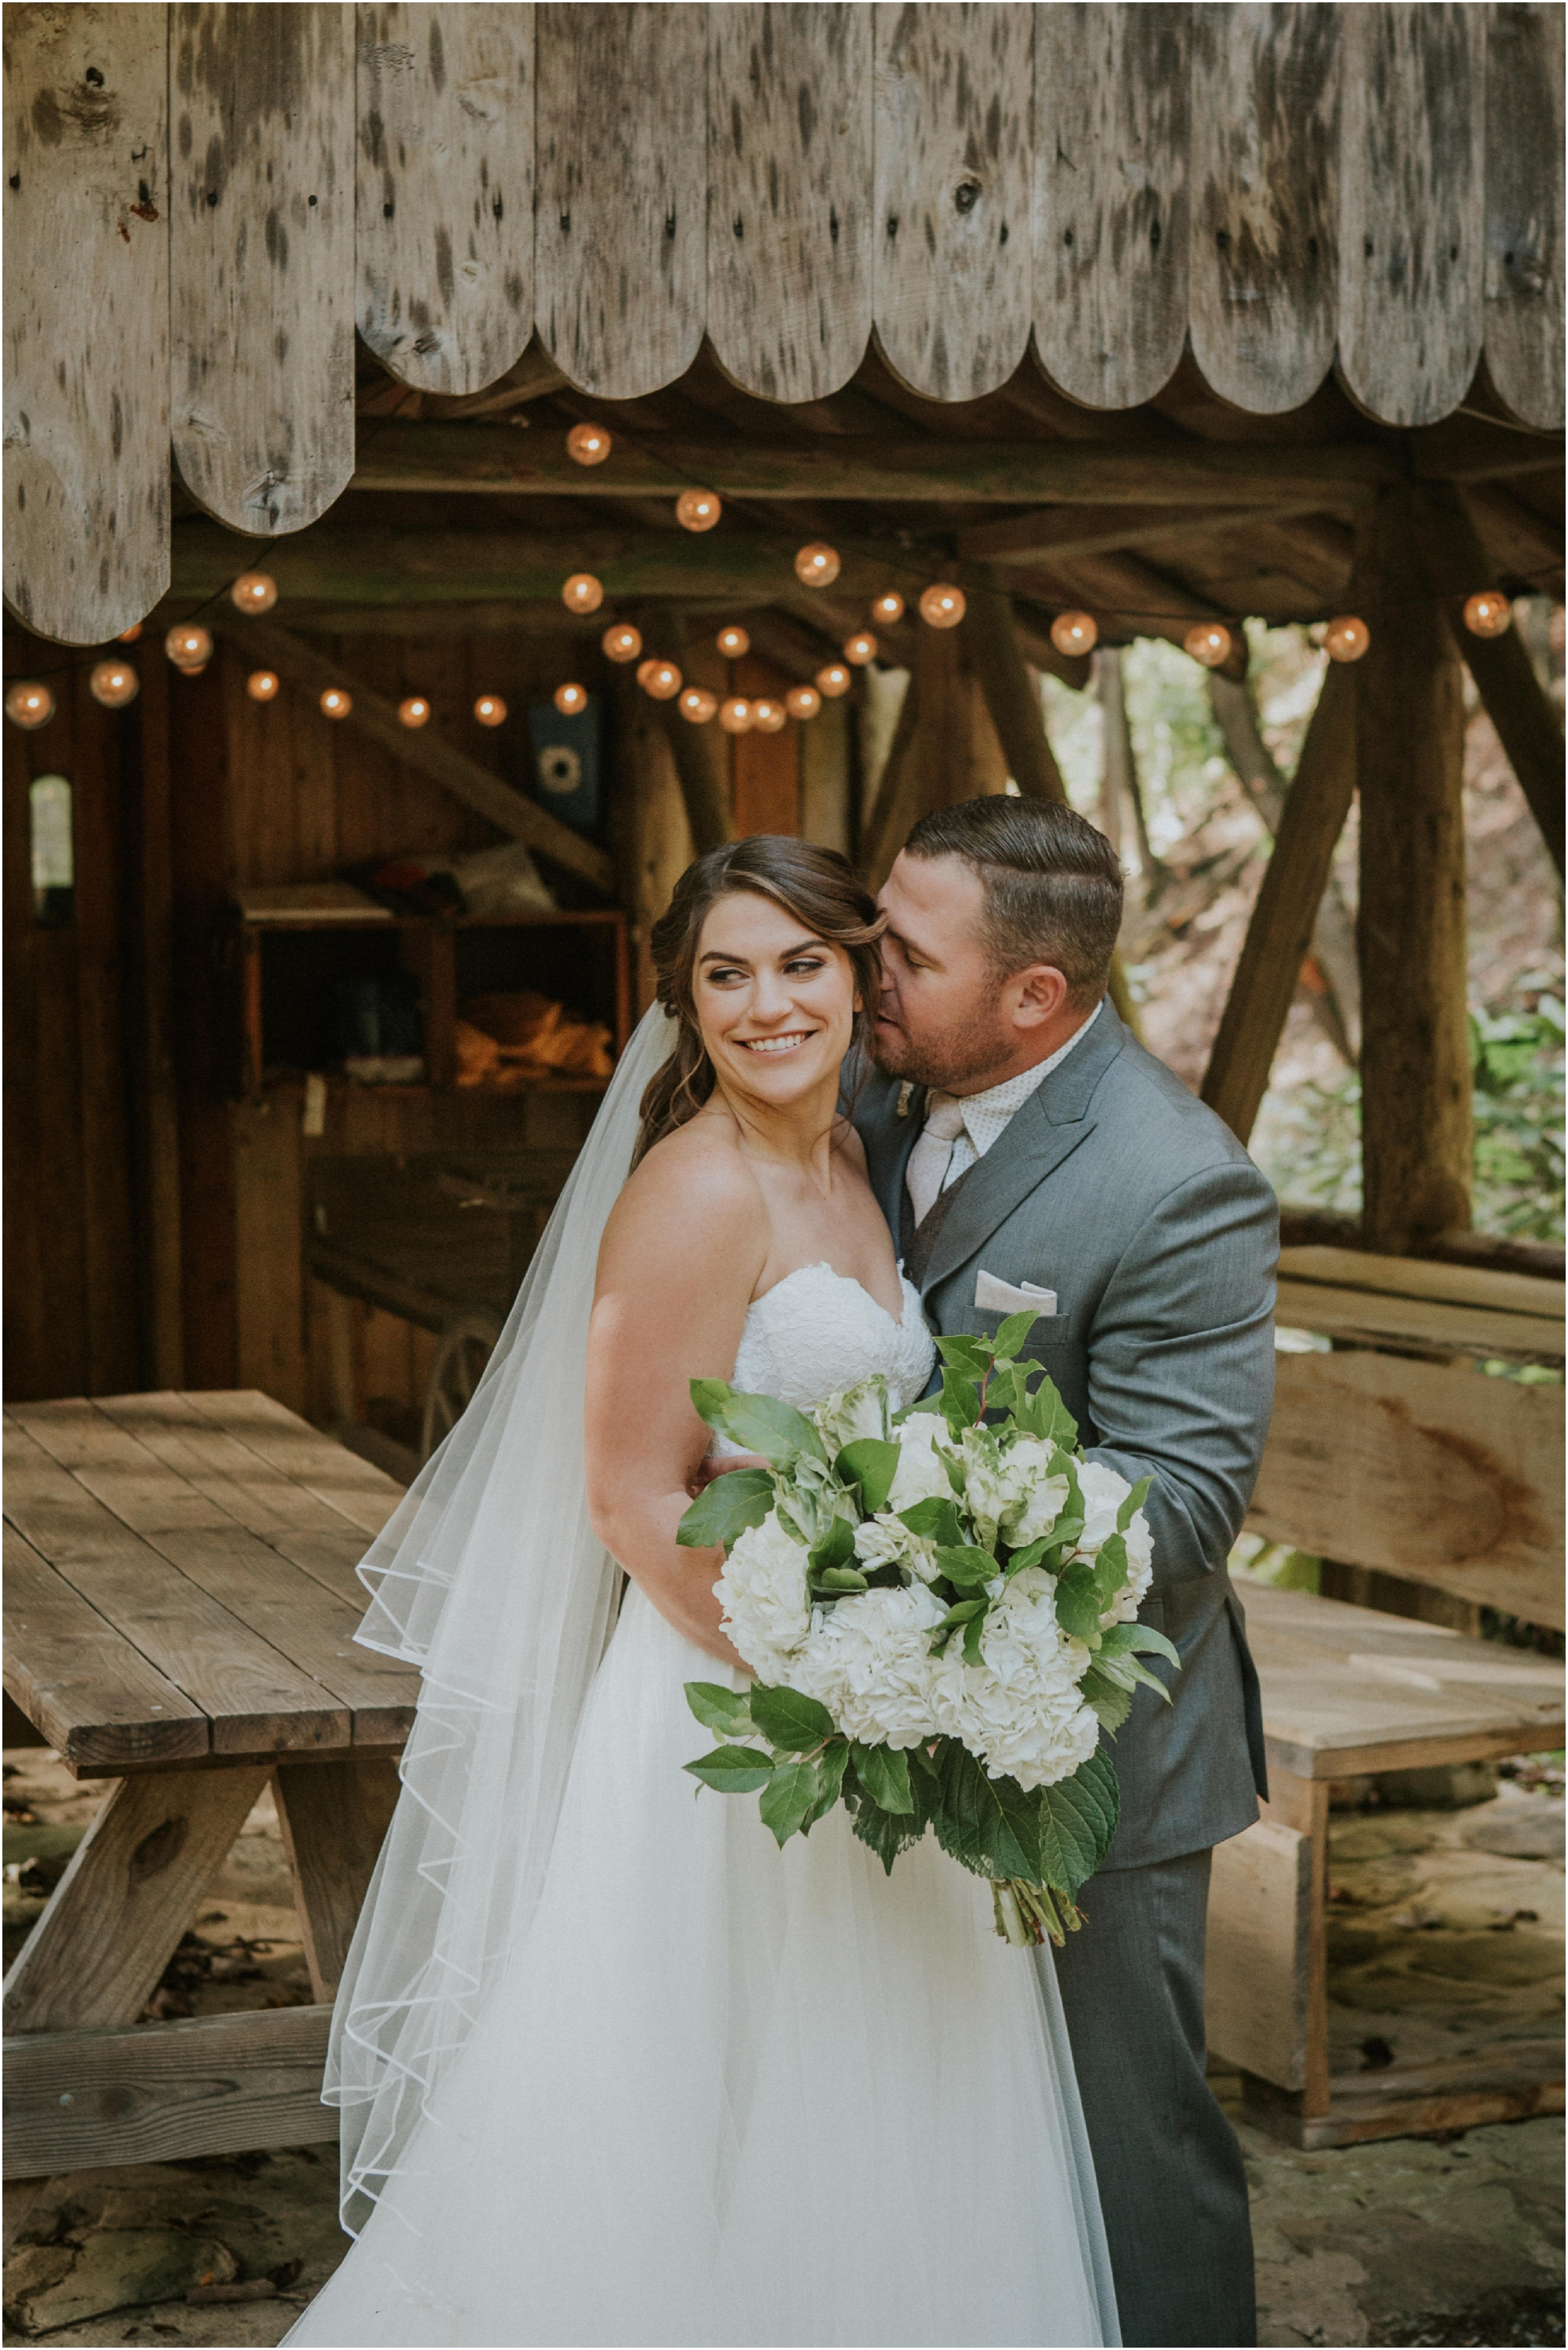 camp-at-buffalo-mountain-jonesborough-tennessee-rustic-wedding-elopement-fall-johnsoncity-northeast-tn_0124.jpg